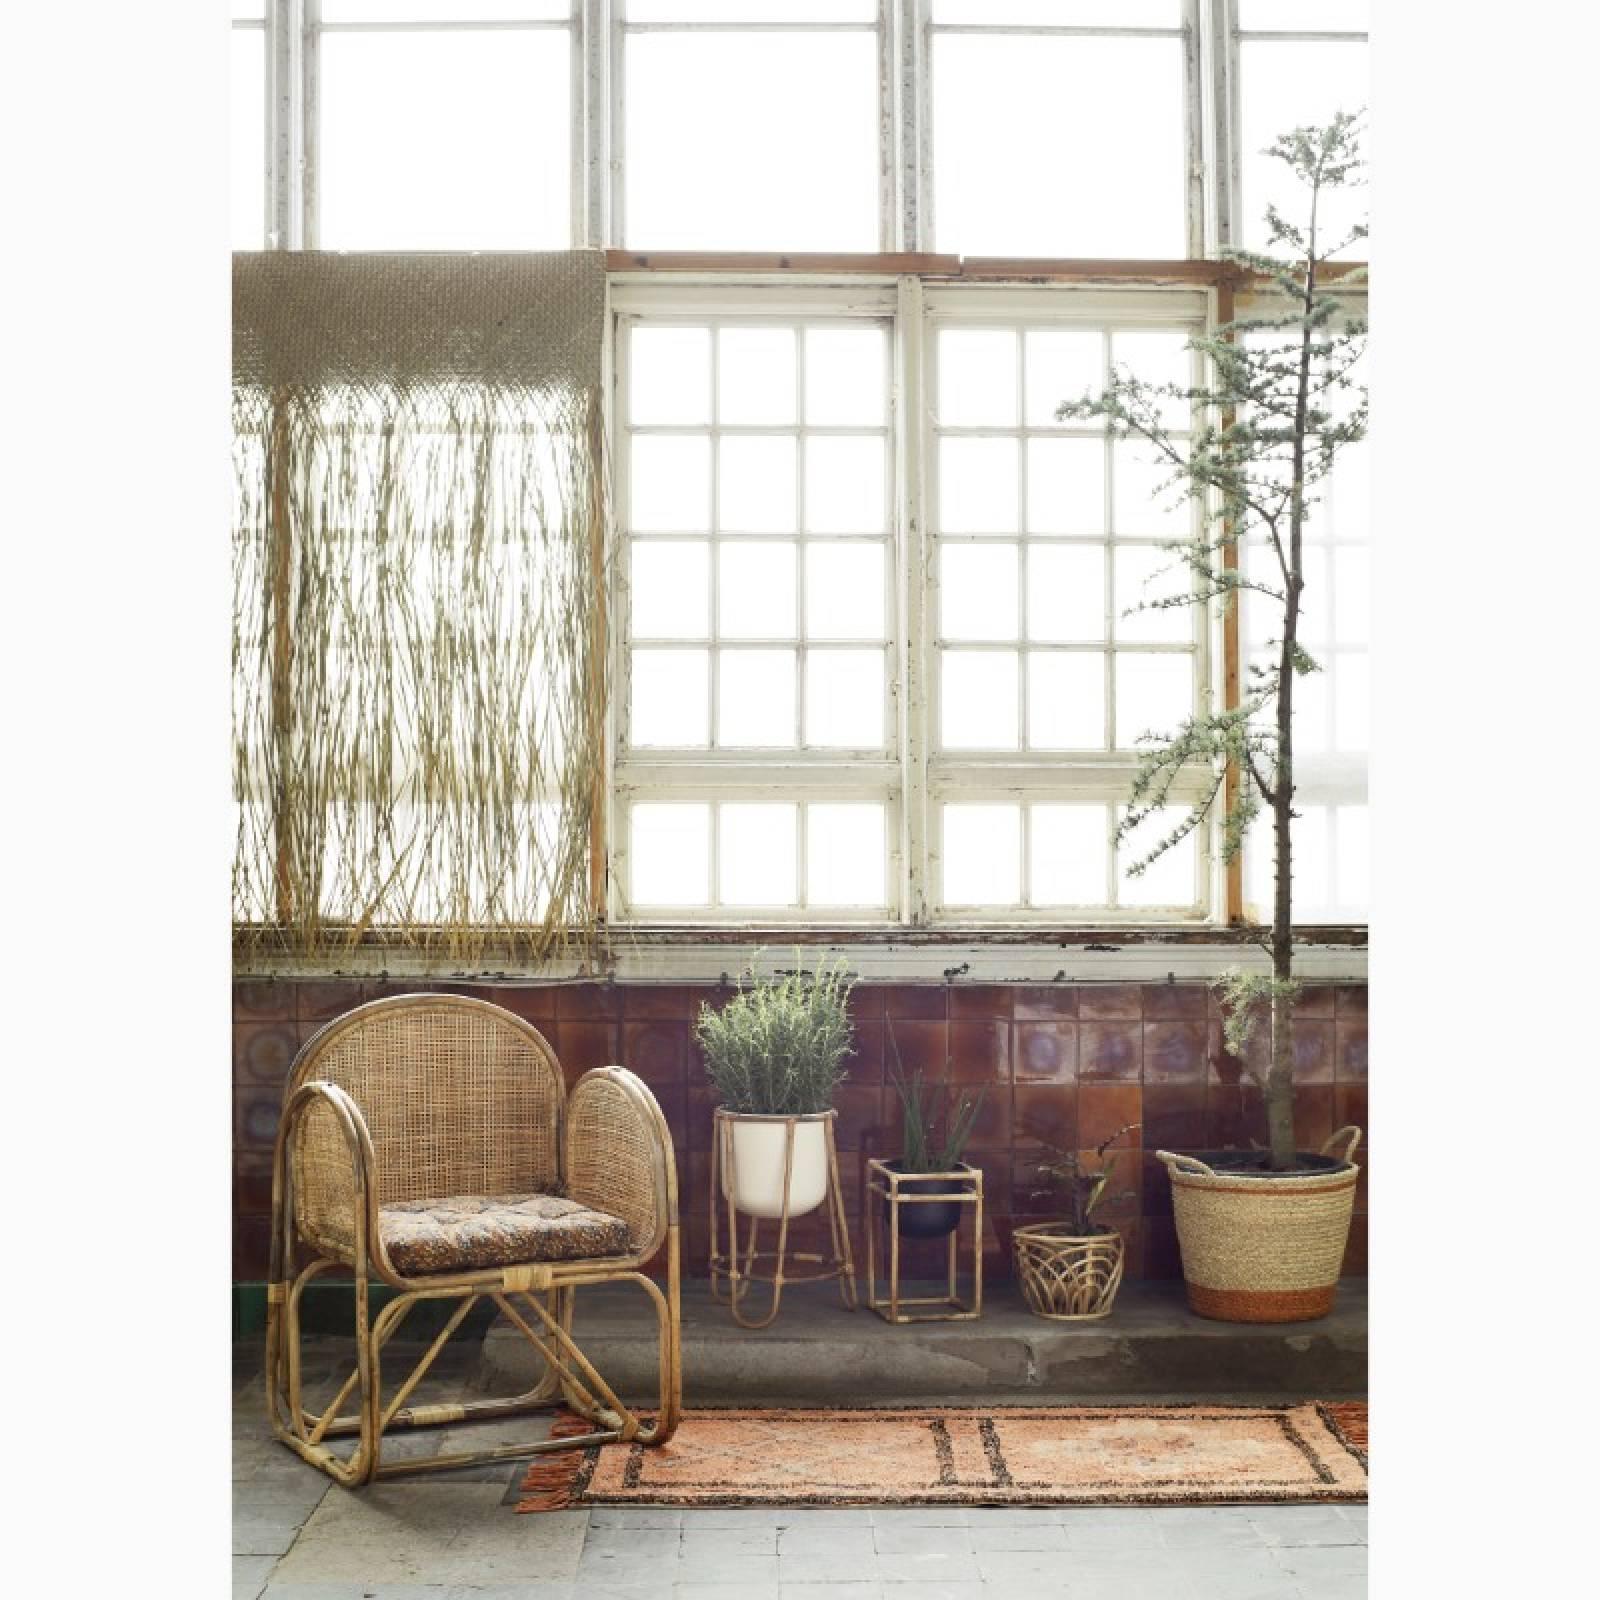 Medium Orange Striped Seagrass Basket With Handles 33x28cm thumbnails